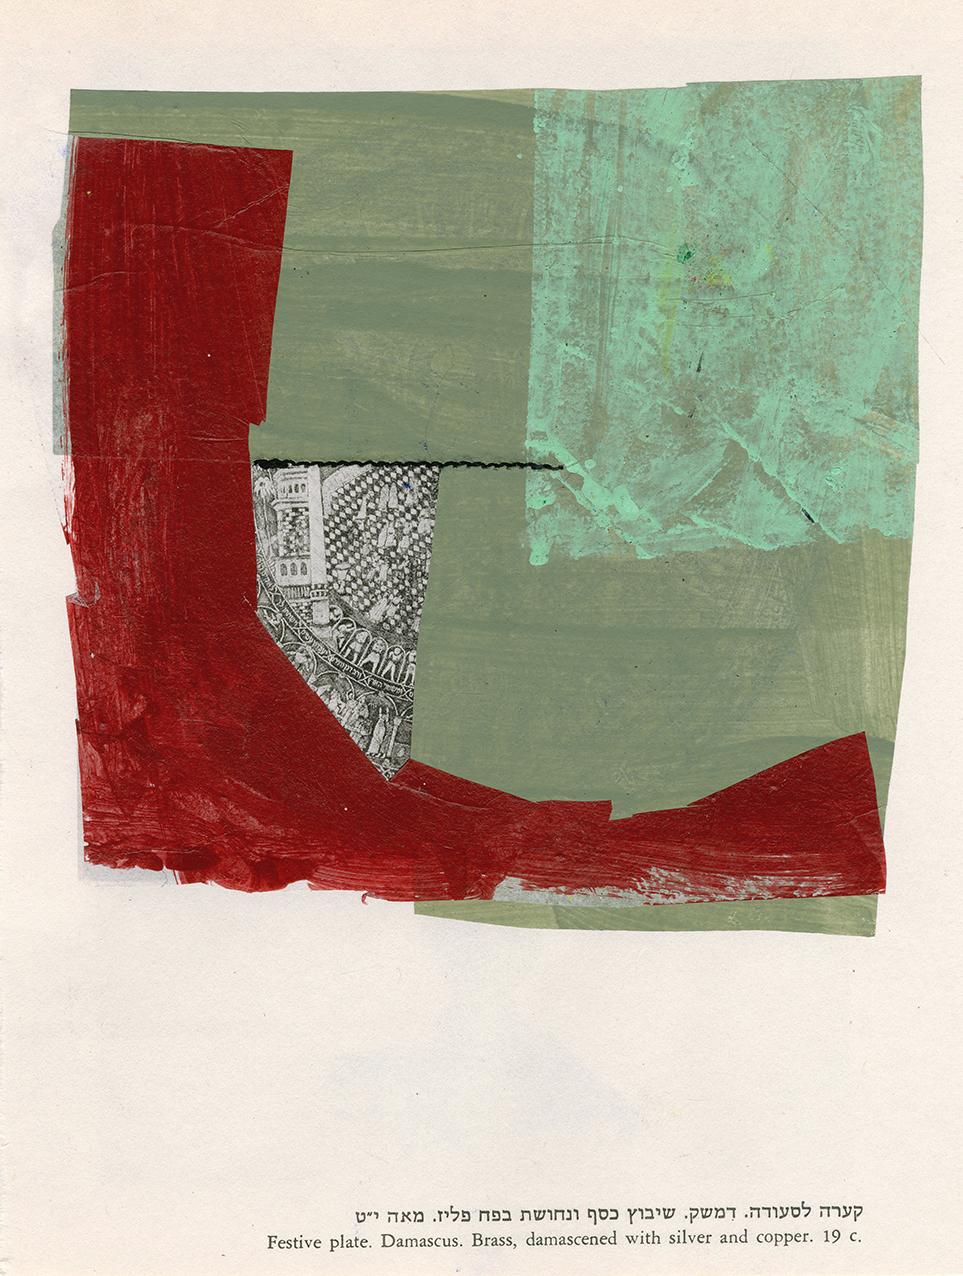 Untitled (Festive plate 2)